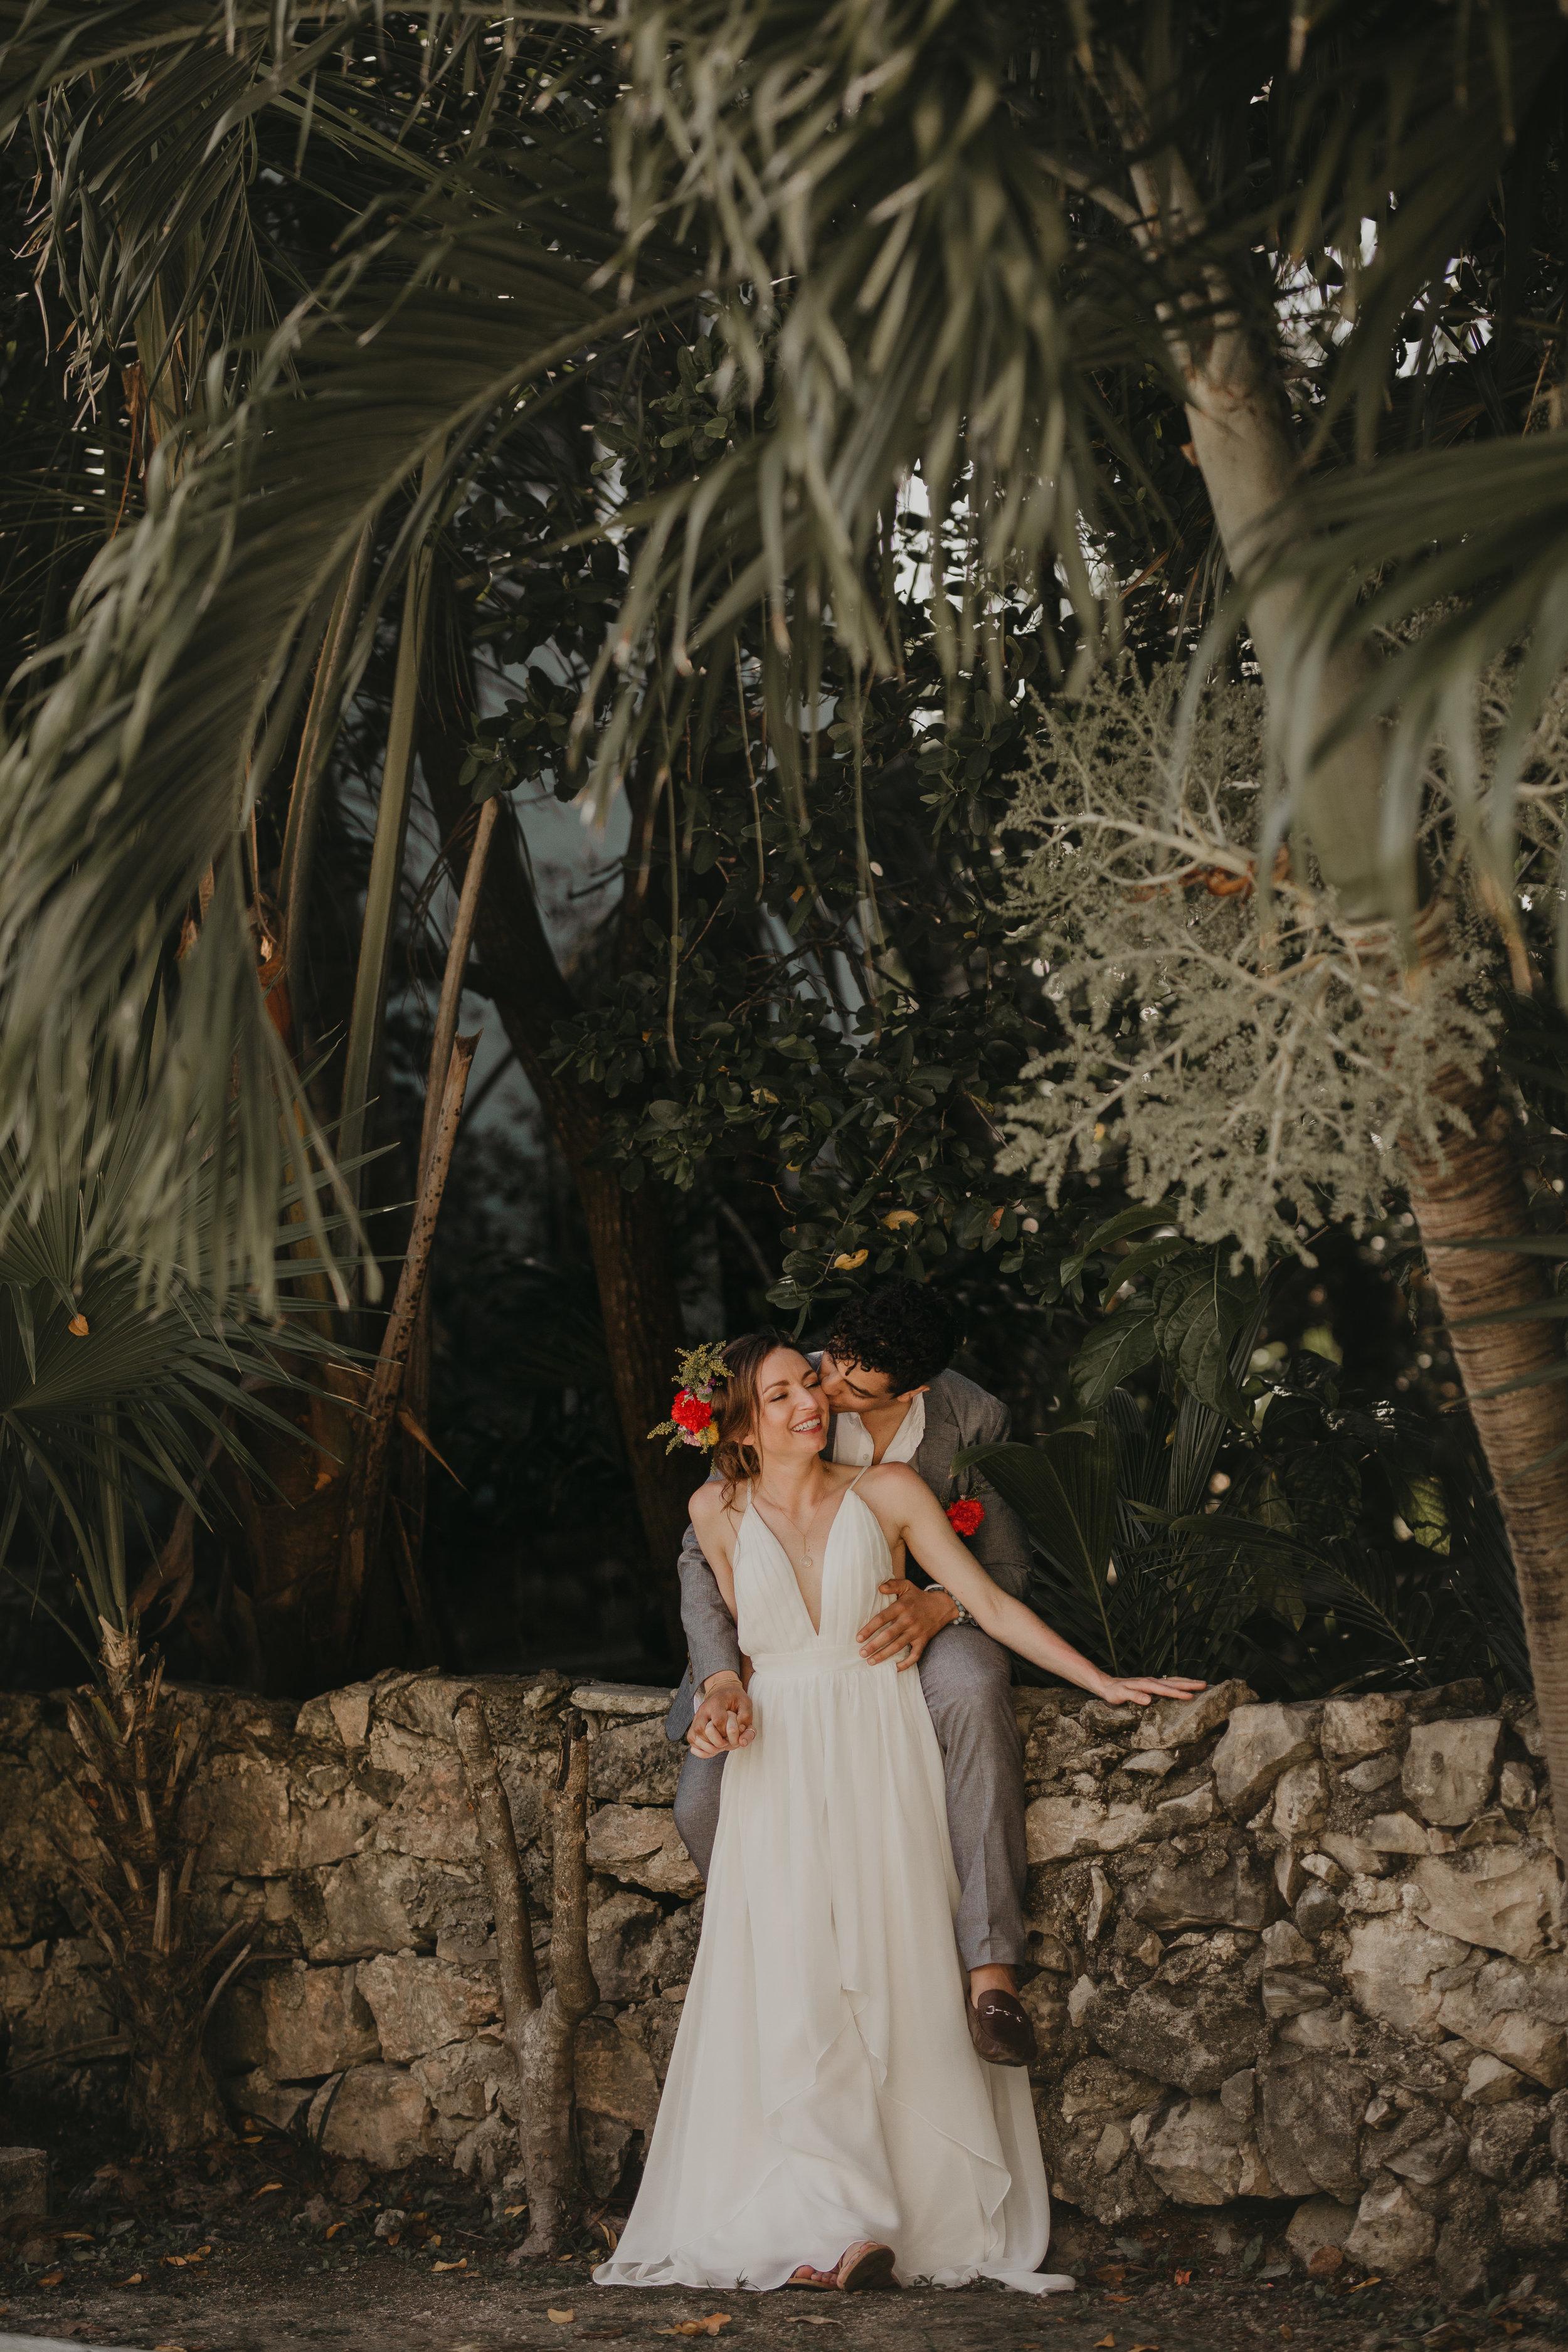 Nicole-Daacke-Photography-beachfront-akumal-destionation-wedding-tulum-mexico-elopement-photographer-destination-wedding-inspiration-sunset-champagne-pop-boho-bride-ocean-tropical-bohemian-tulum-wedding-photos-134.jpg